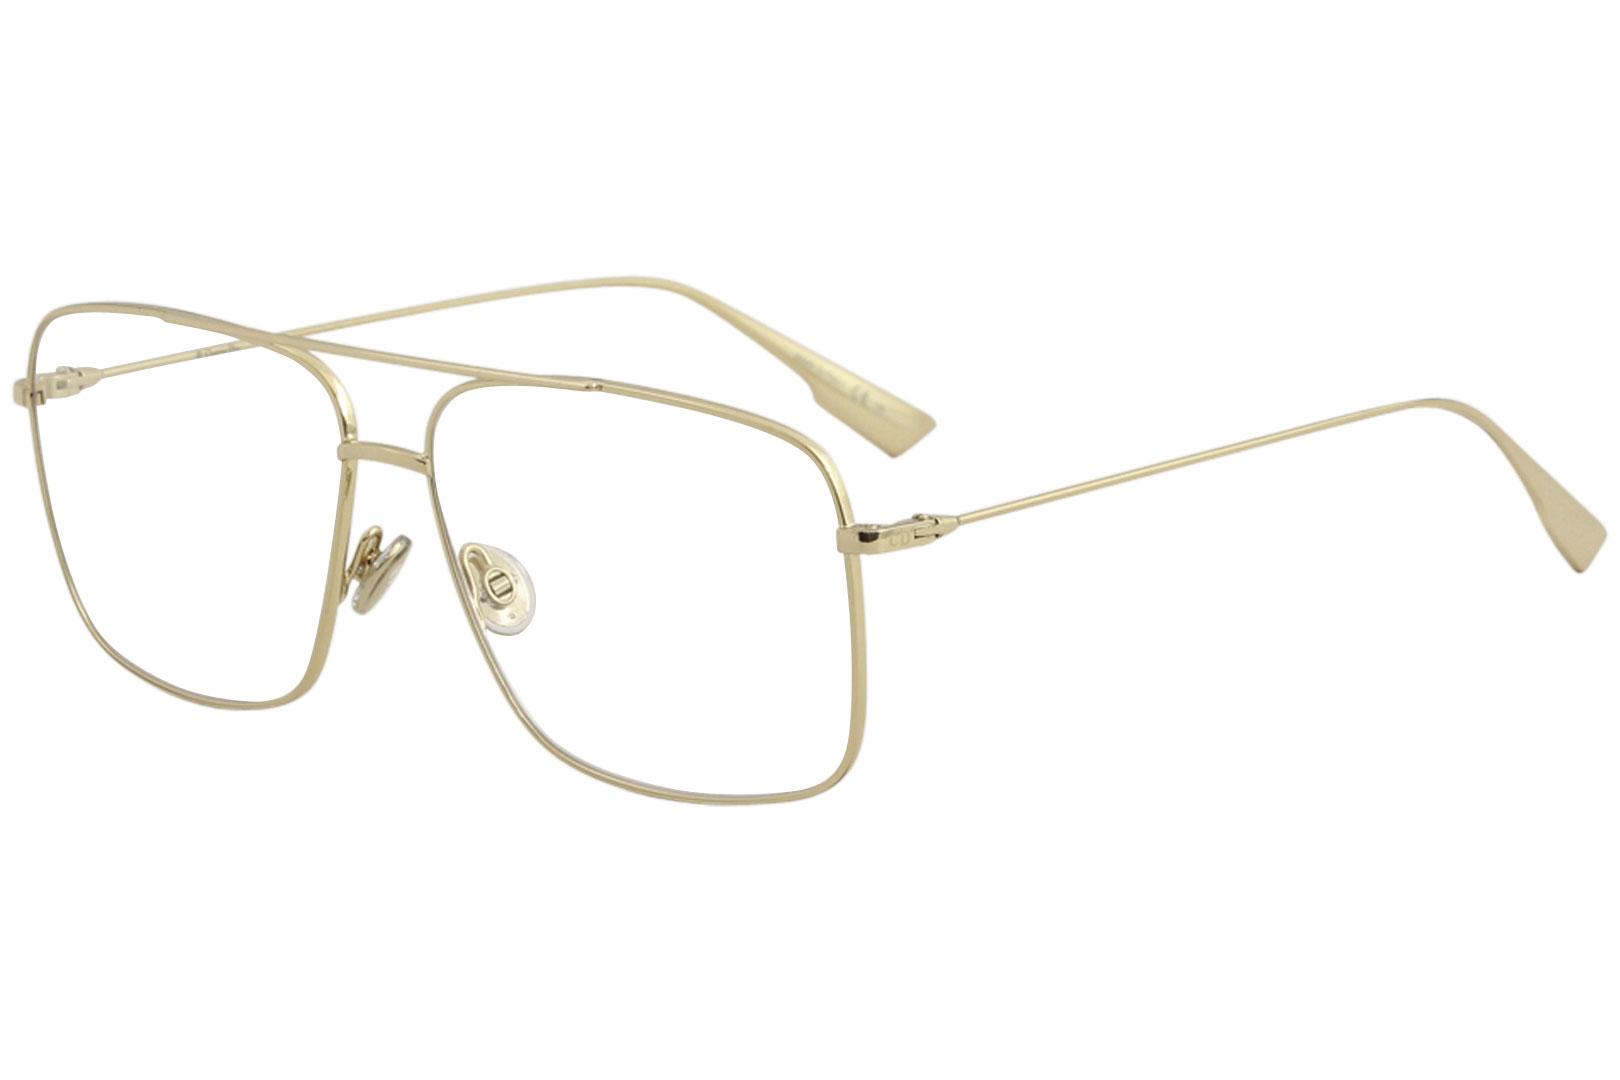 2dbf63e4a1 Christian Dior Eyeglasses Women's DiorStellaireO3 J5G Gold Optical ...